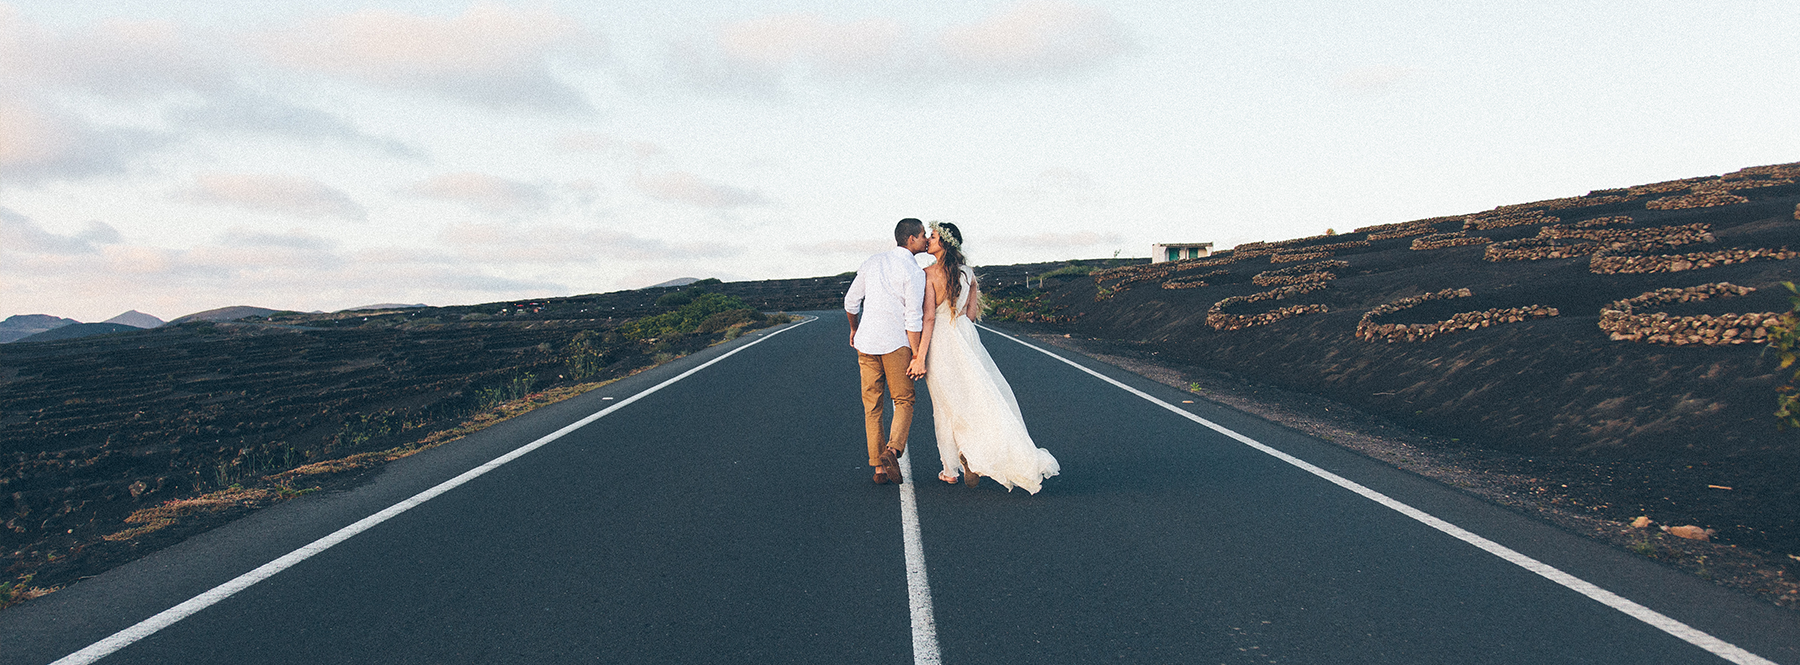 portada-fotografos-boda-originales